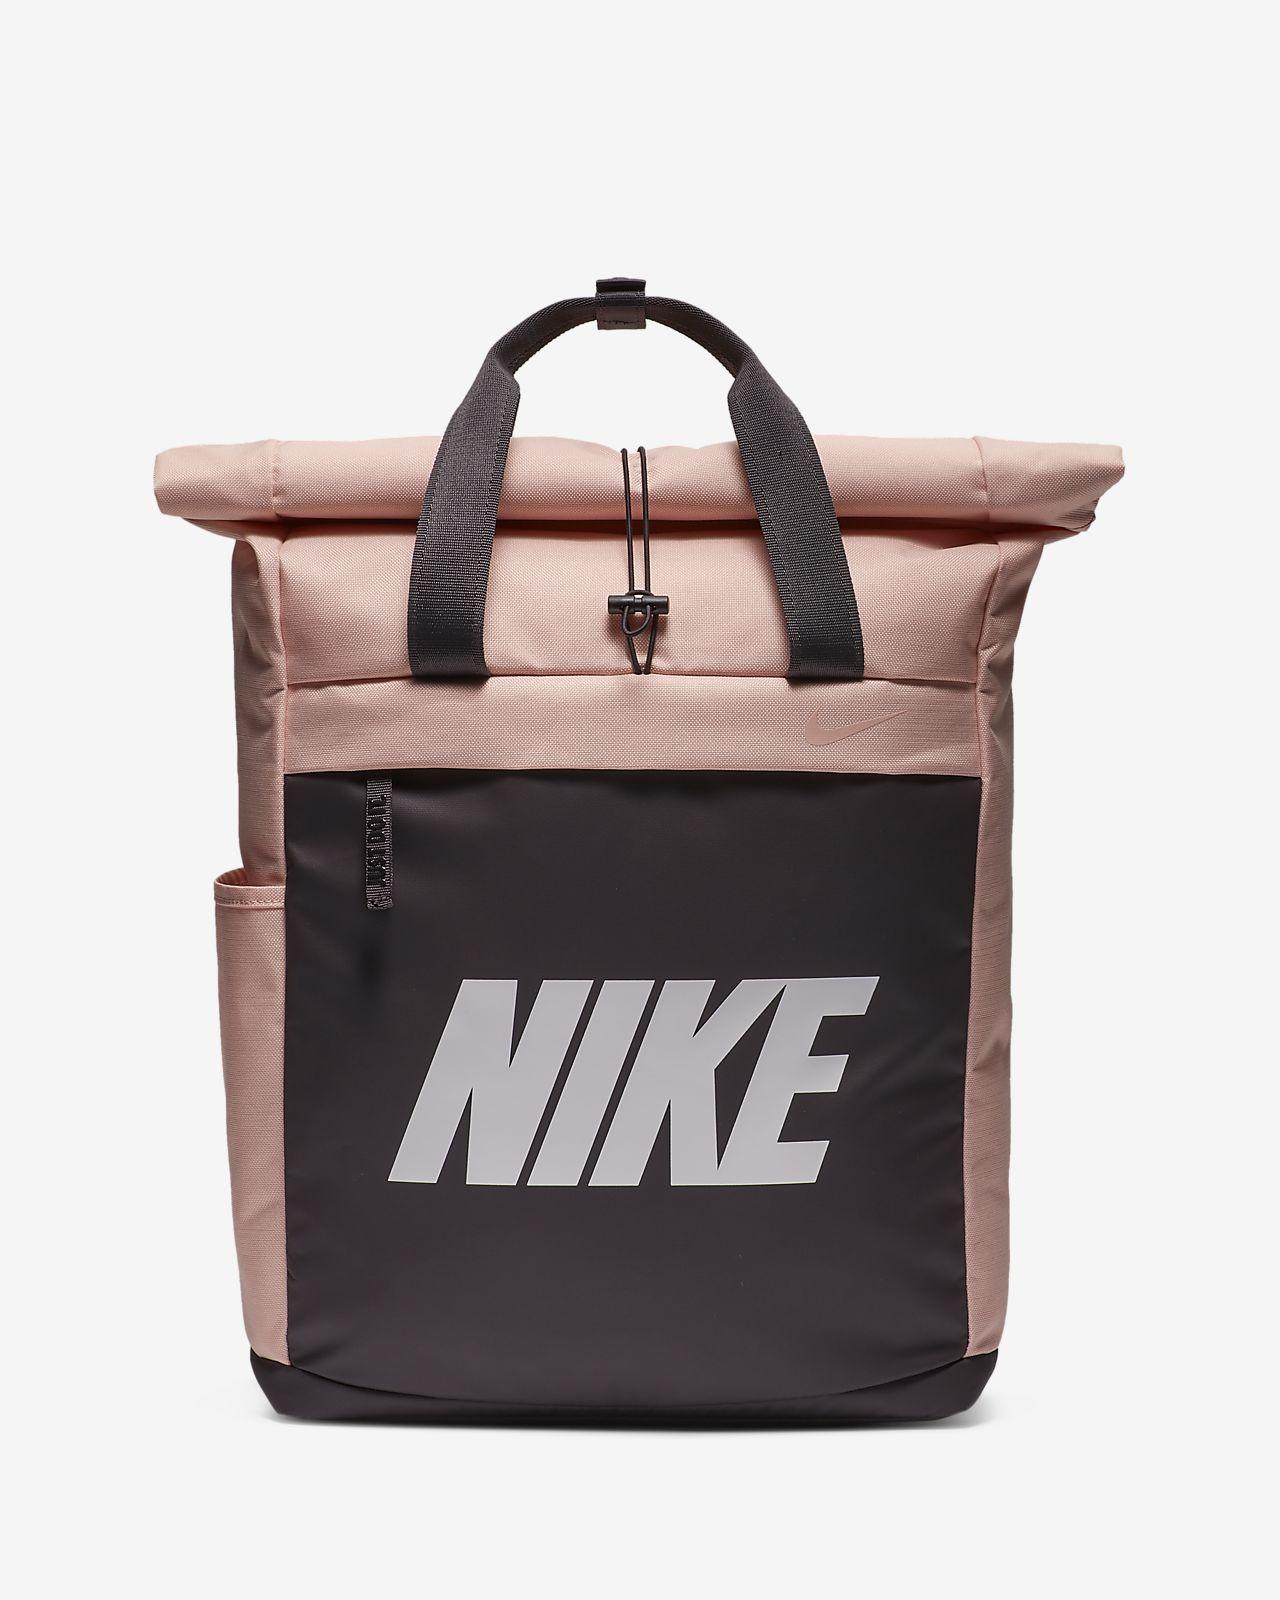 9e0977e4120 Nike Radiate Women s Training Graphic Backpack. Nike.com NL